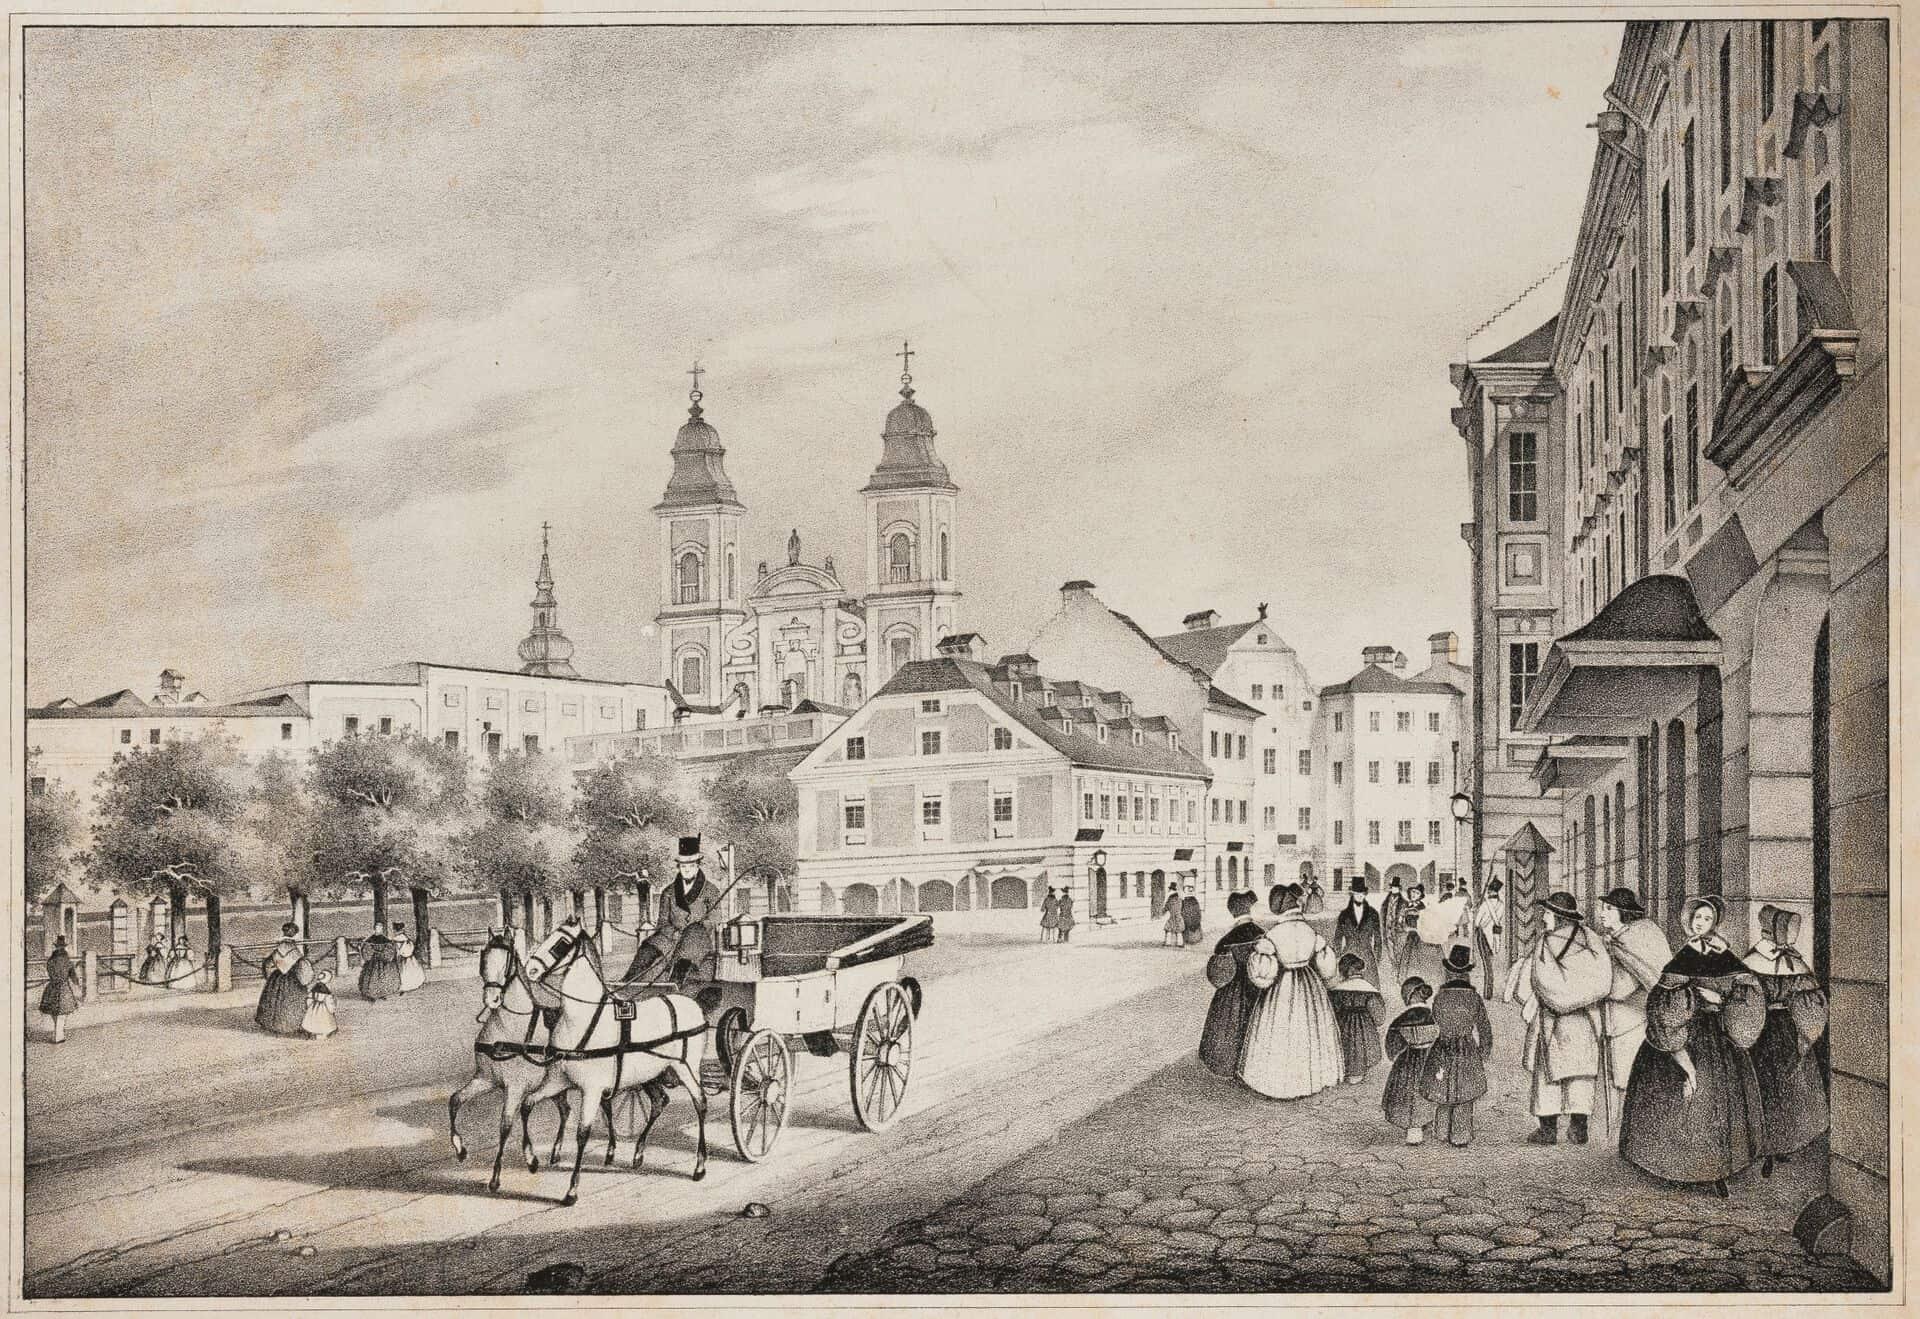 181002-02.02 Josef Hafner, Lithograhpe _Promenade um 1860_-0005_copyright_Robert_Maybach